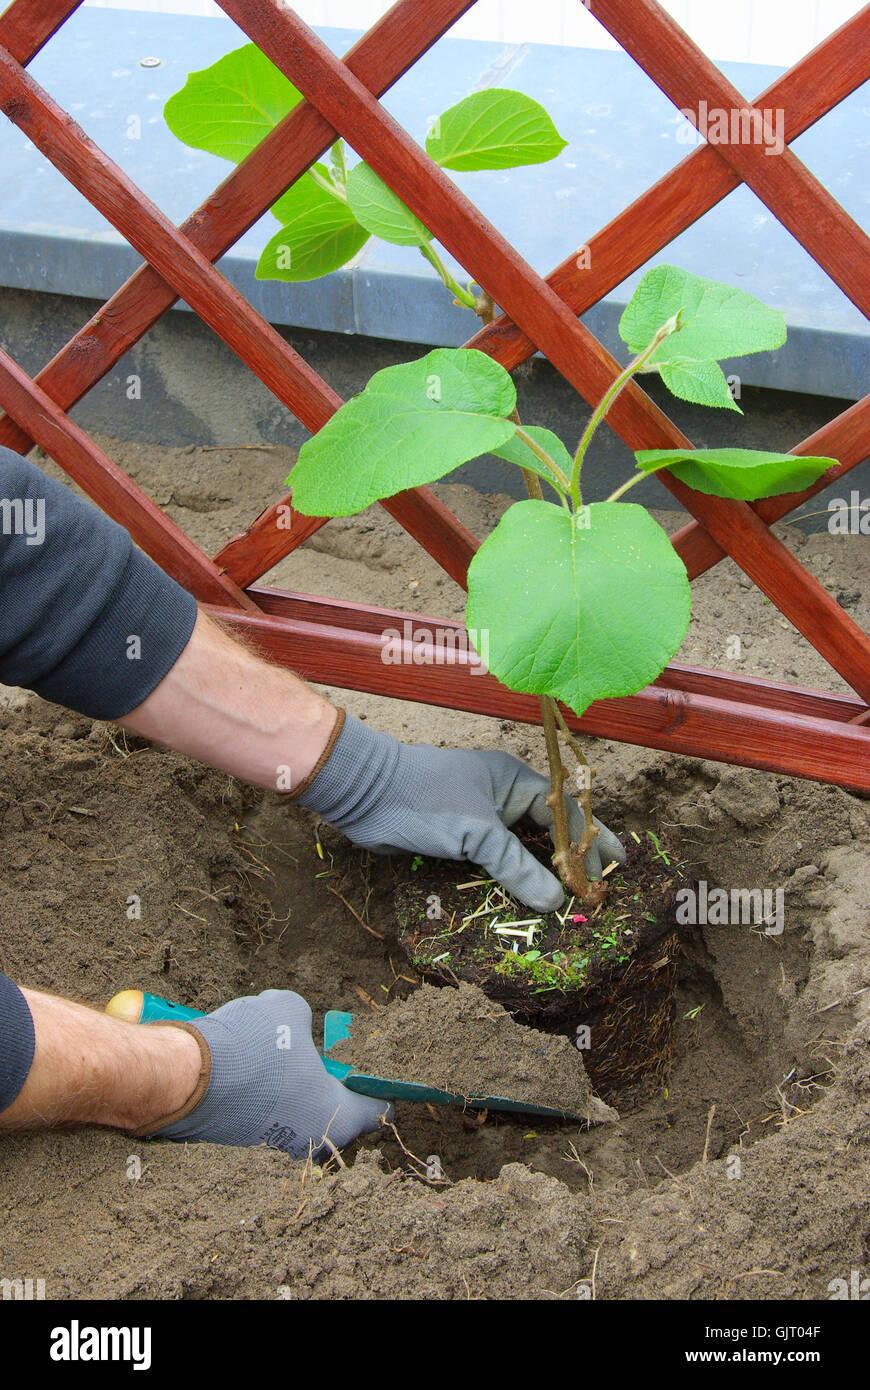 kiwipflanze plants - planting a kiwi plant 02 - Stock Image